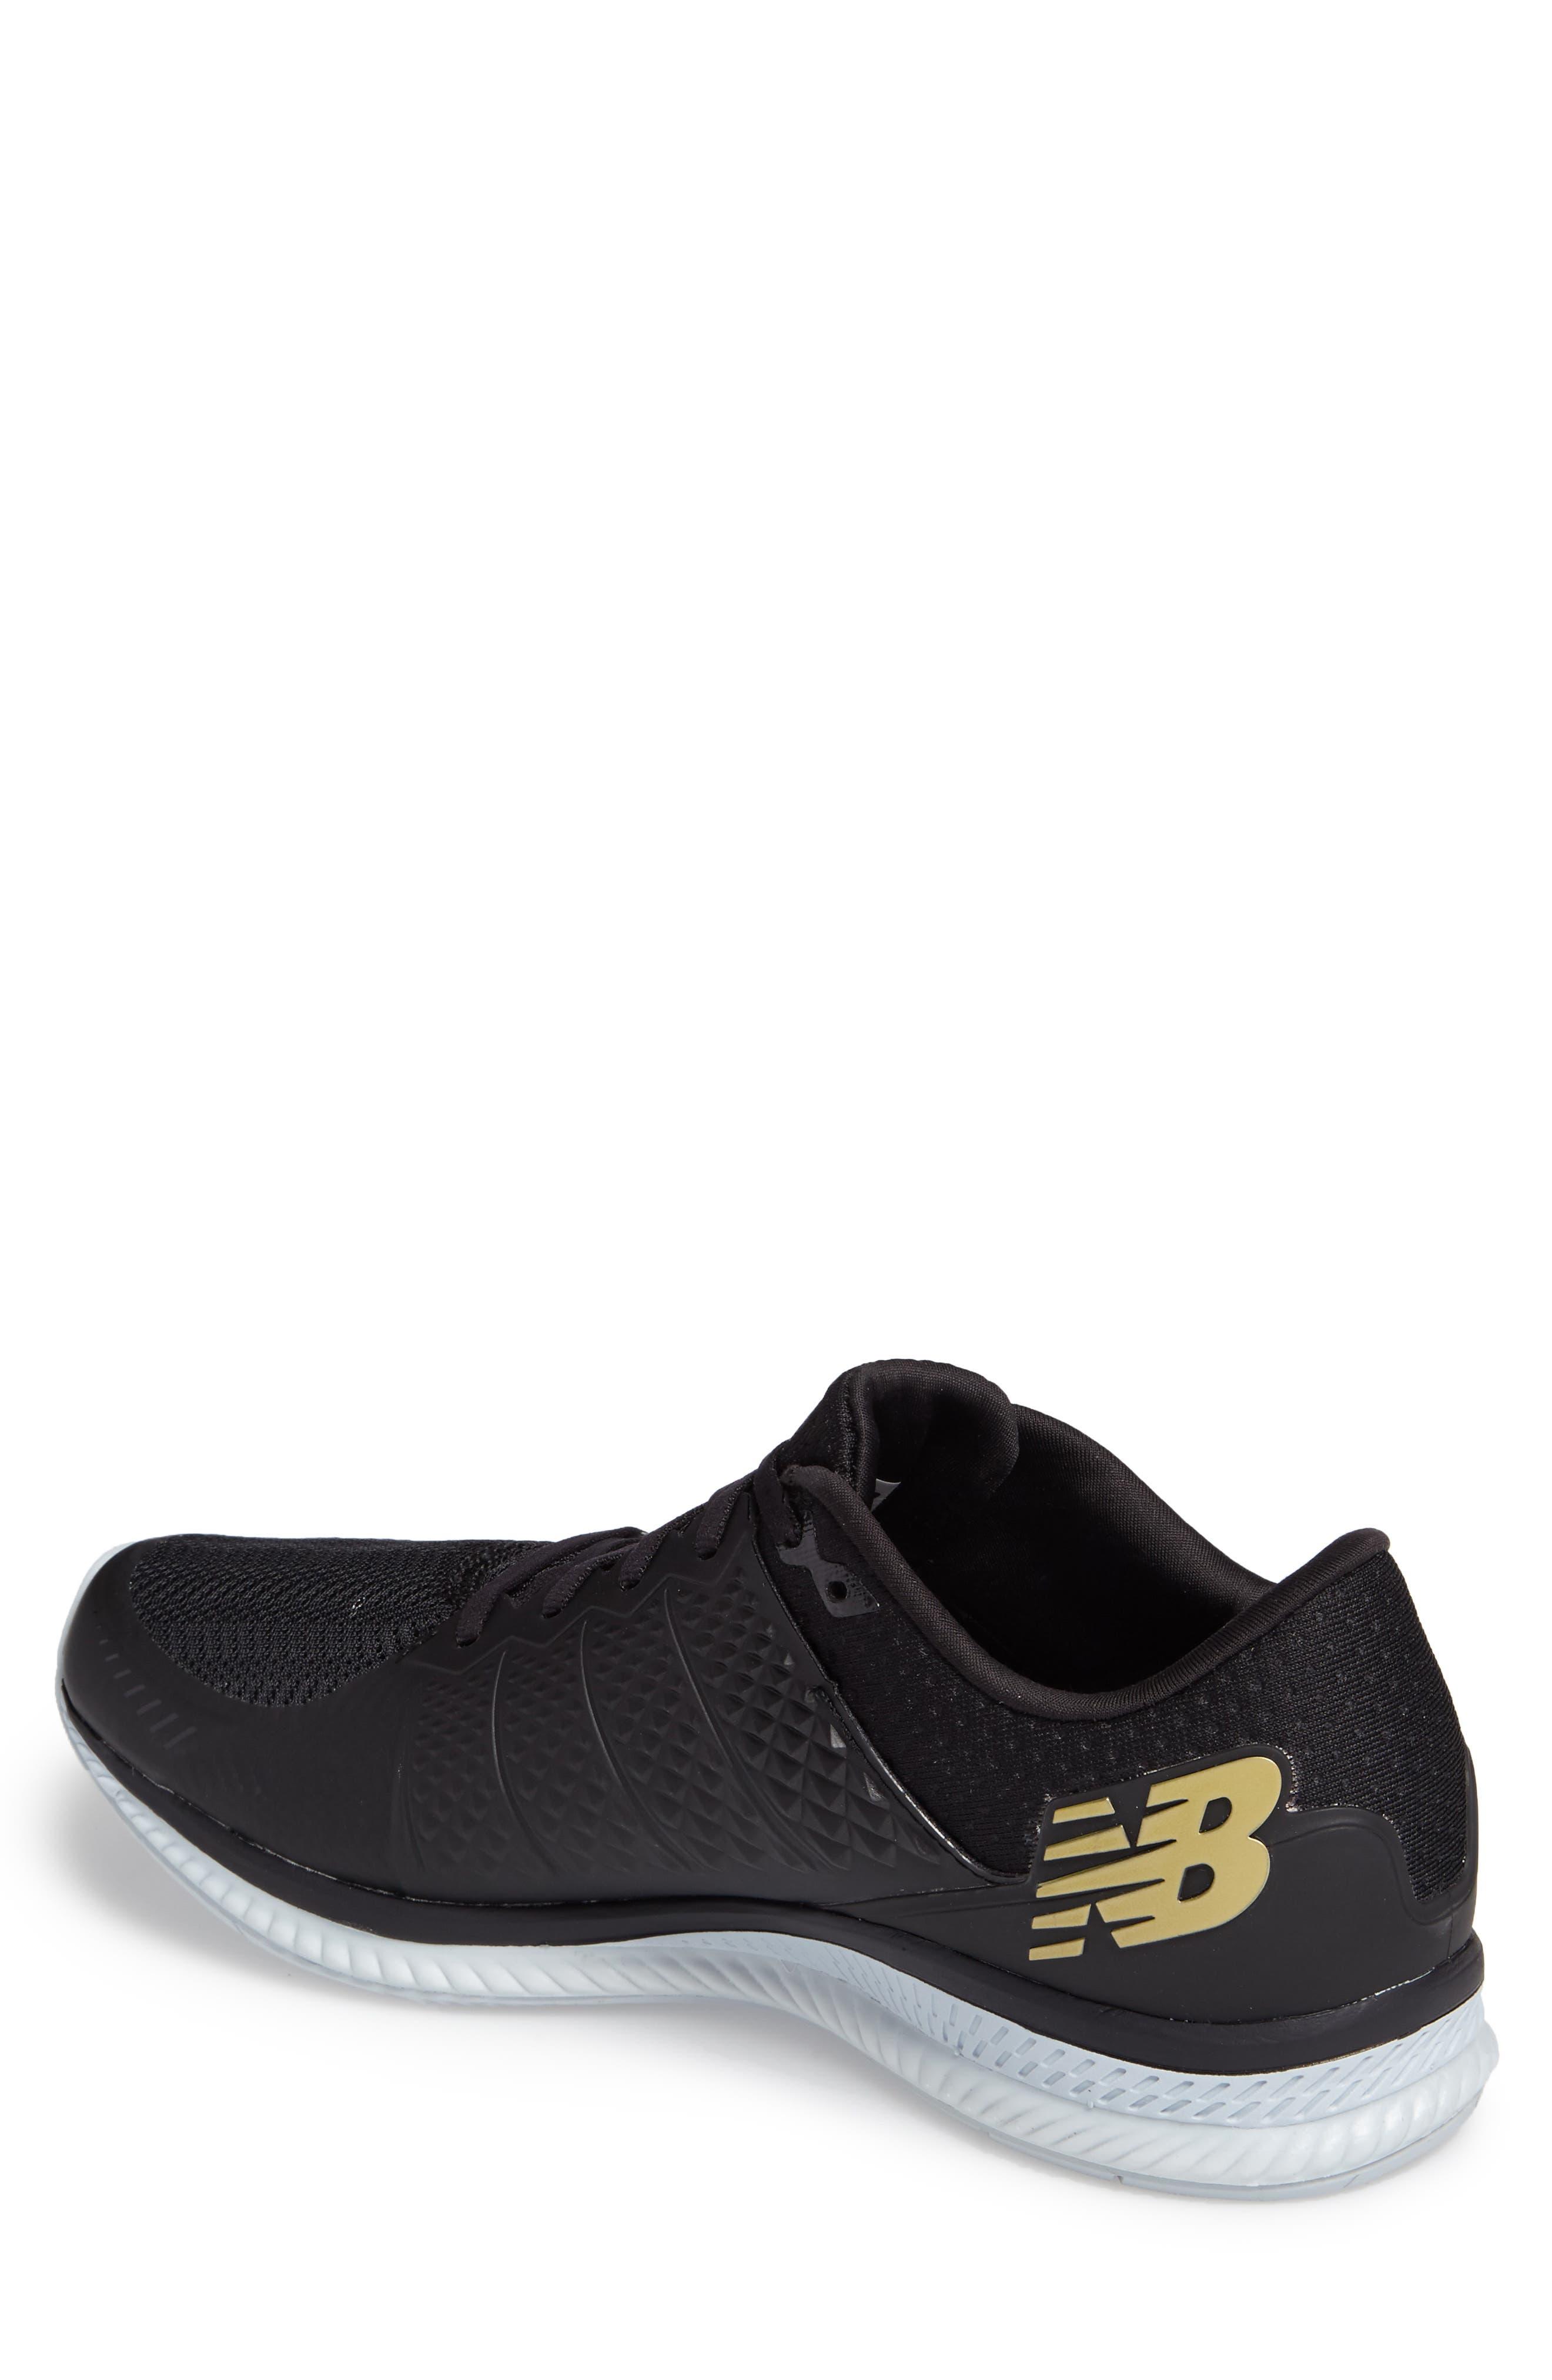 Alternate Image 2  - New Balance Vazee Fuel Cell Running Shoe (Men)